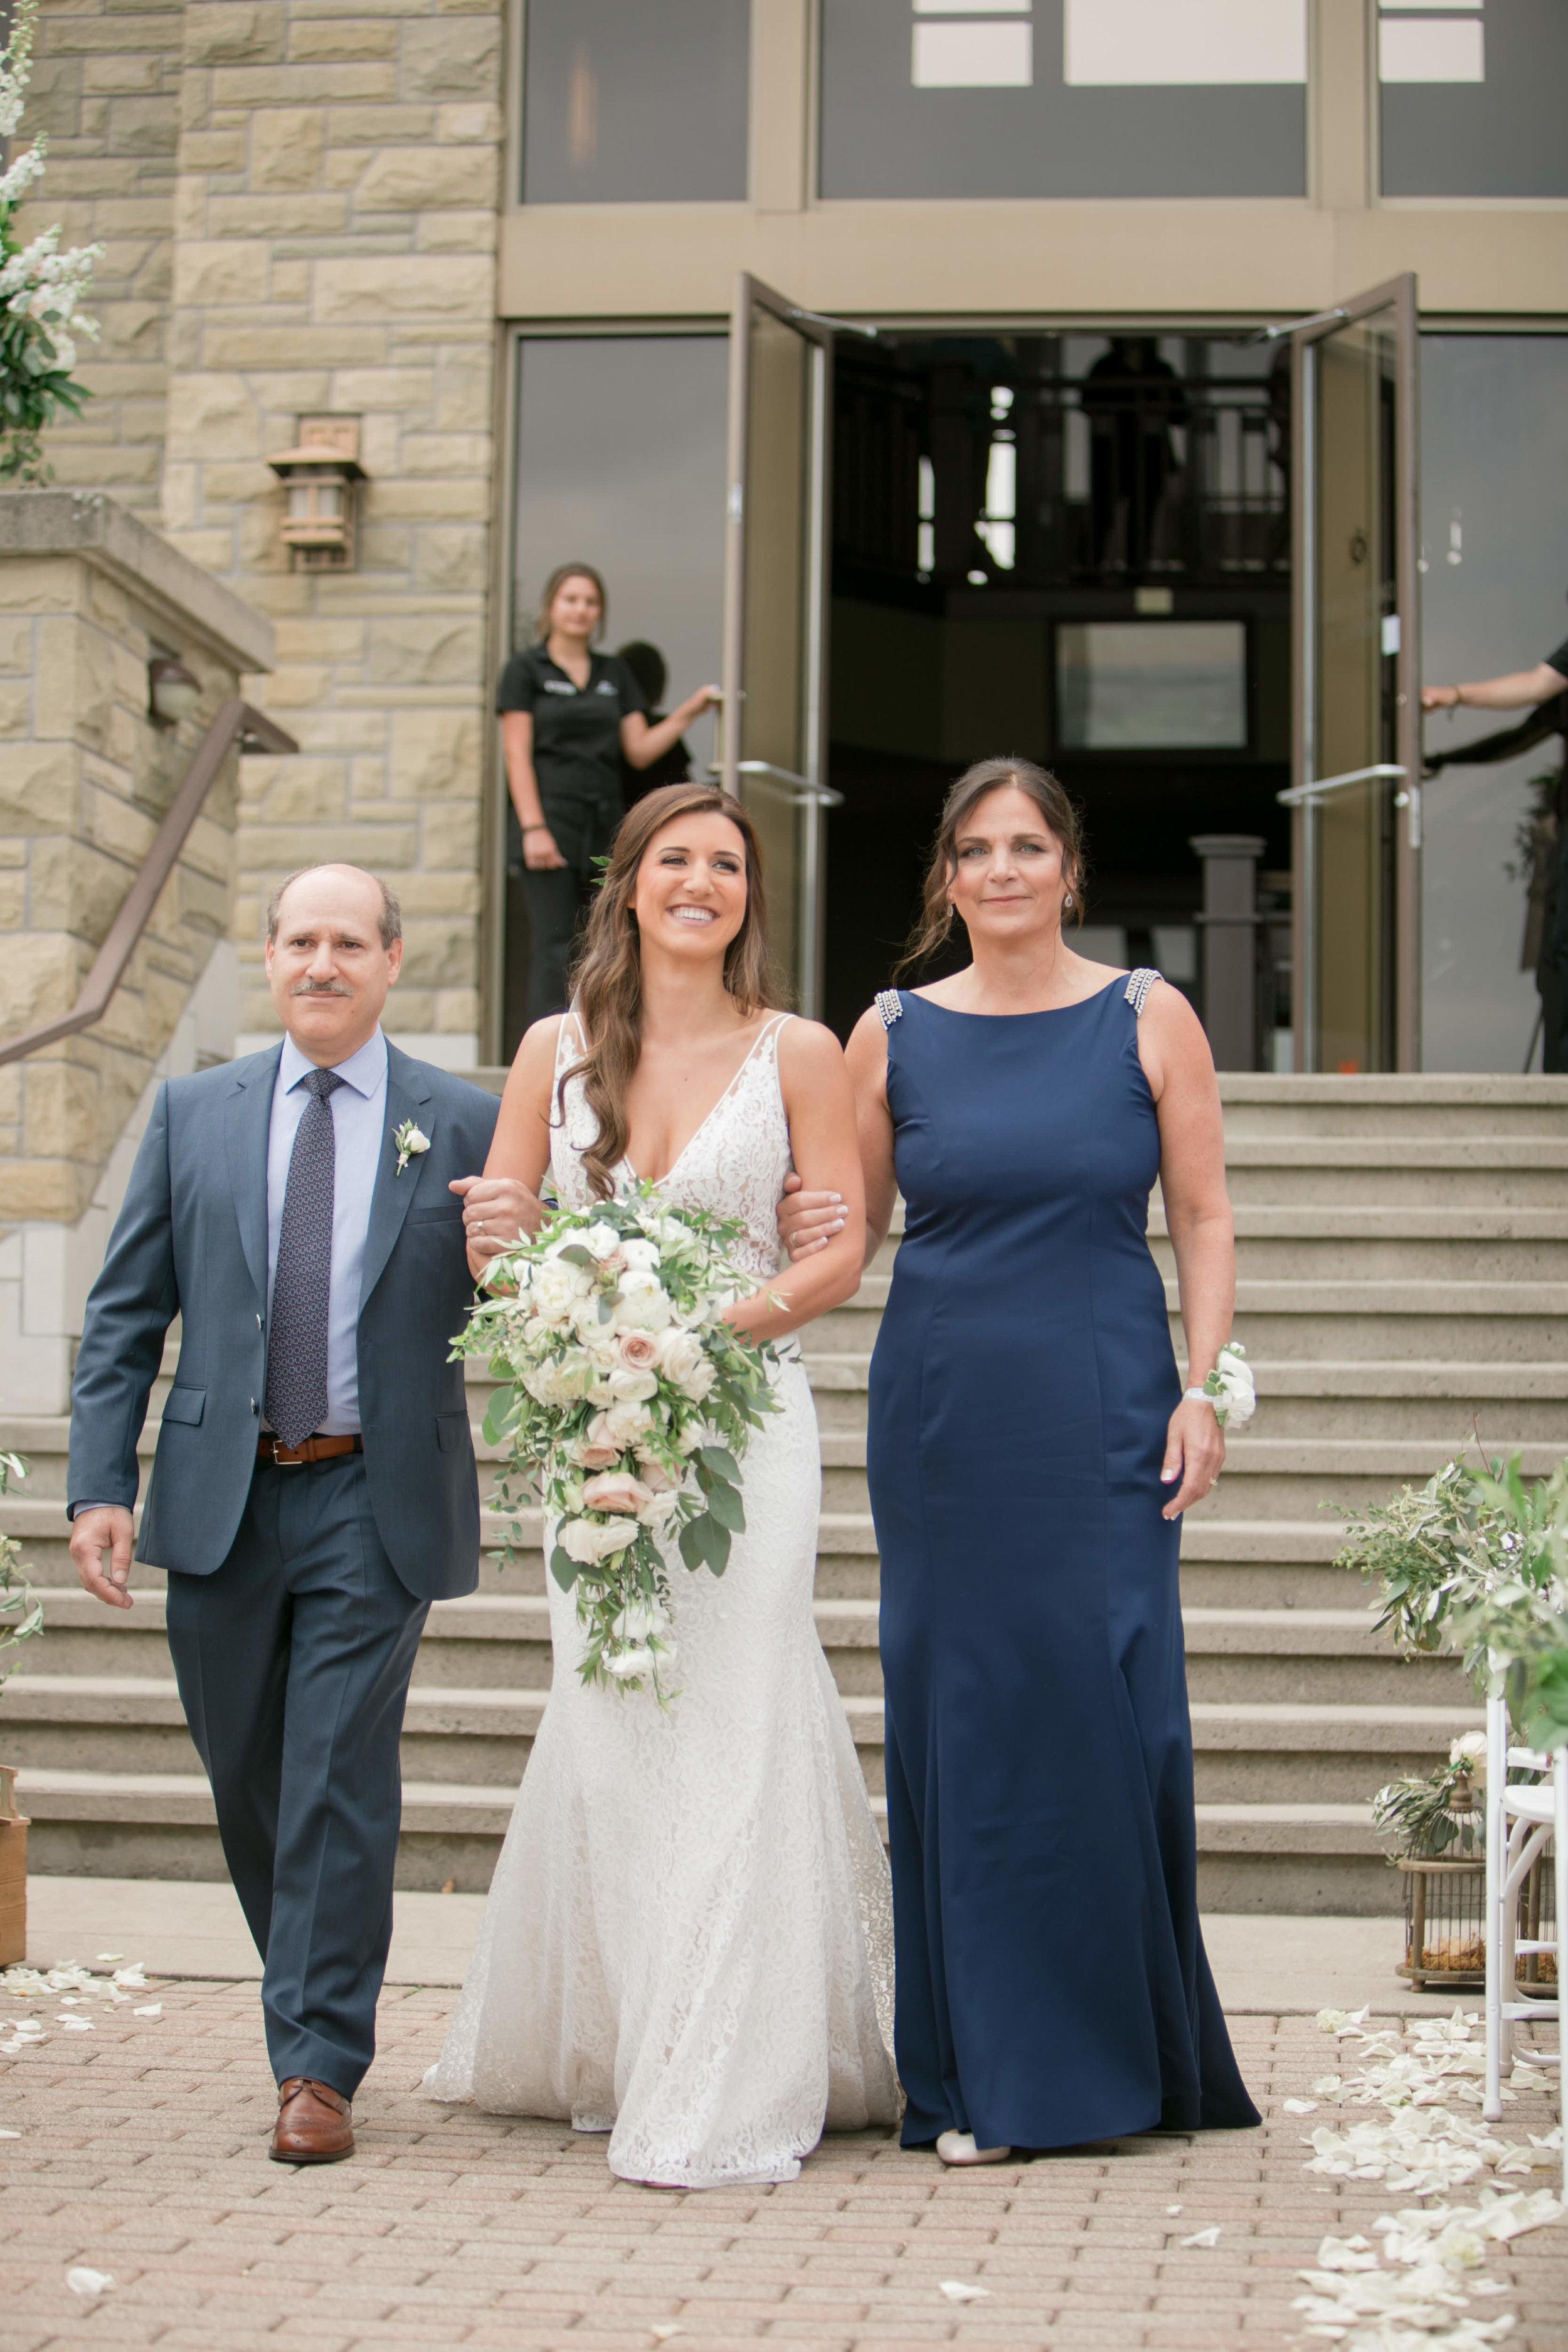 Miranda___Daniel___Daniel_Ricci_Weddings___High_Res._Finals_303.jpg